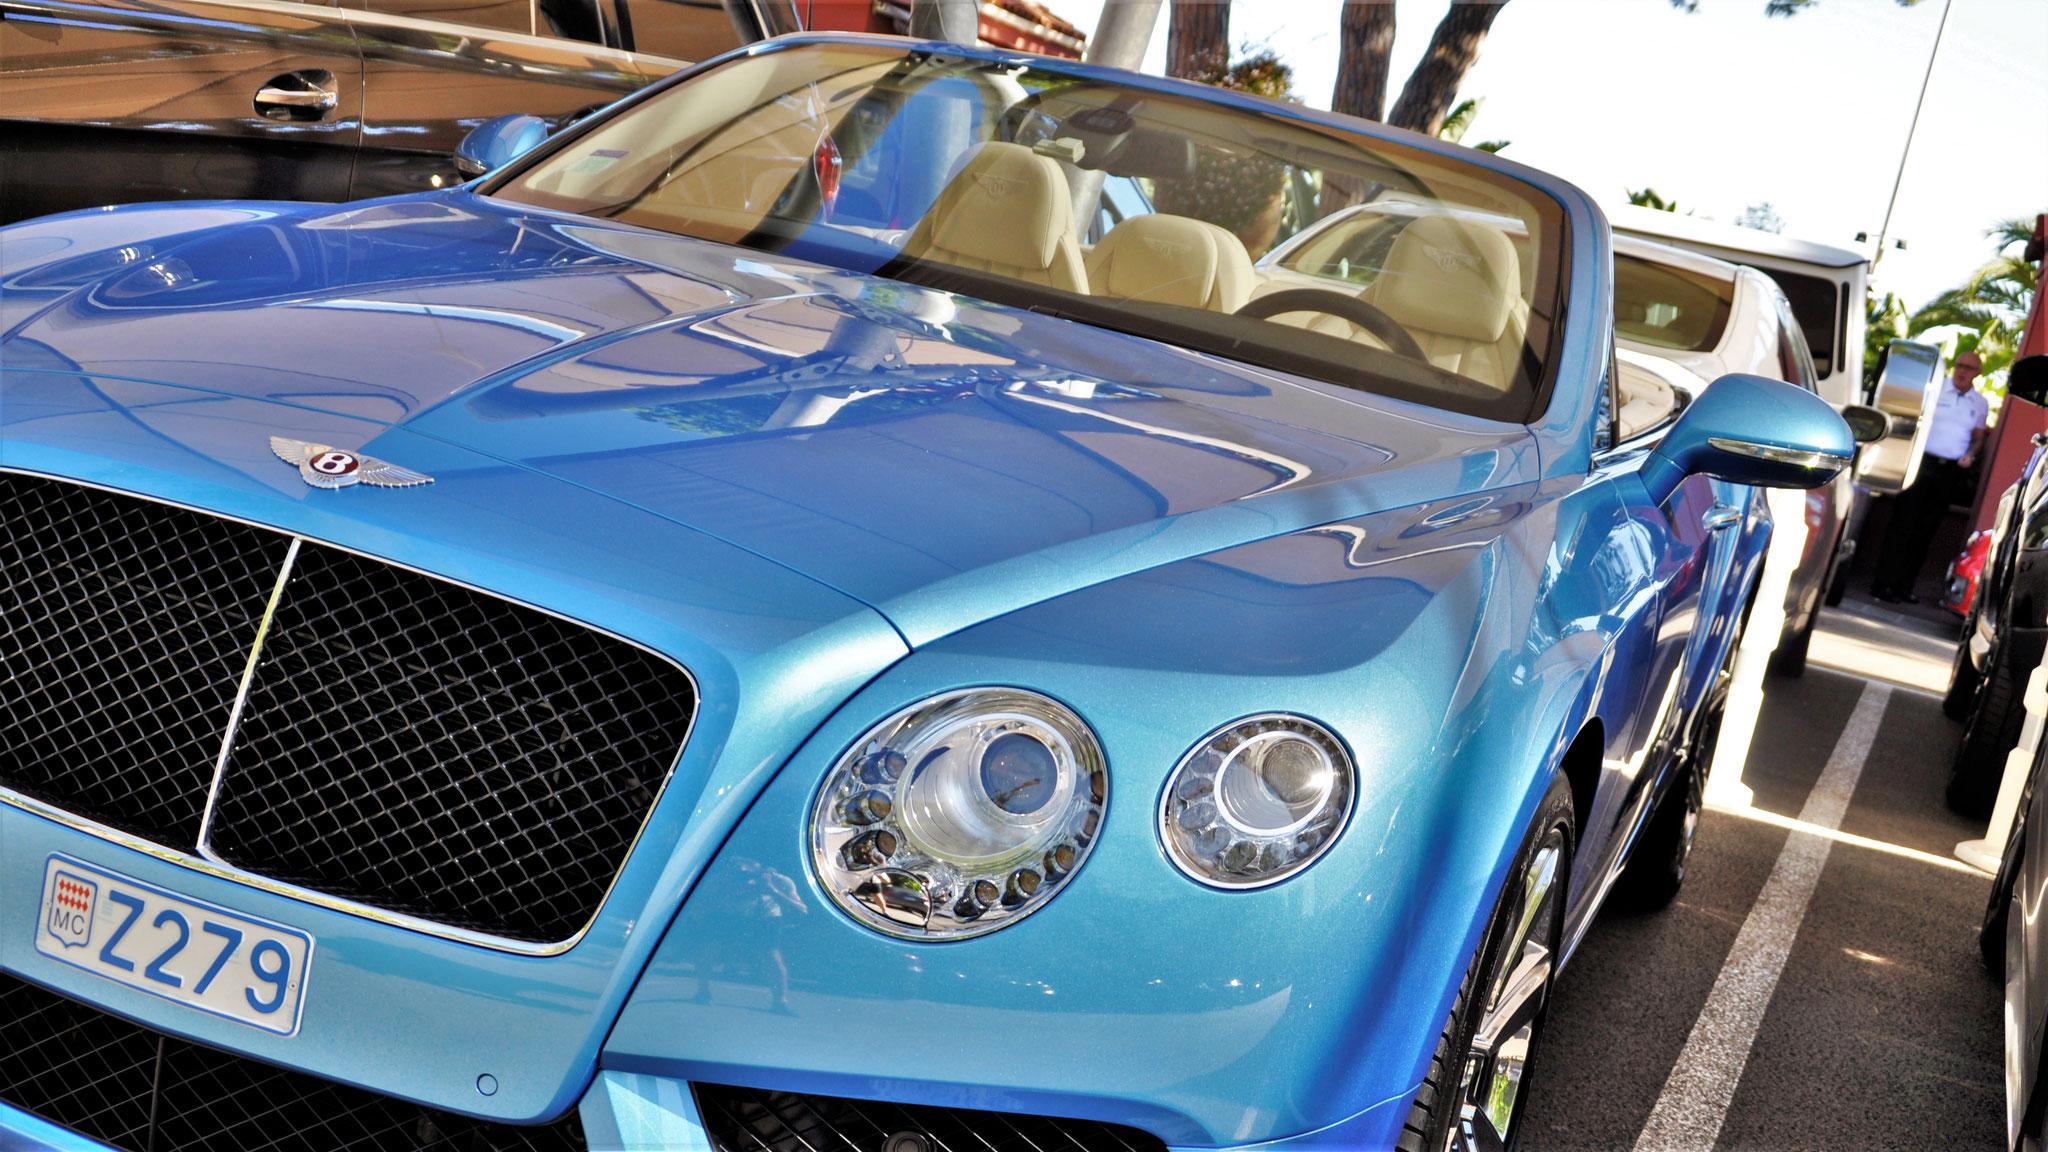 Bentley Continental GTC V8 S - Z279 (MC)